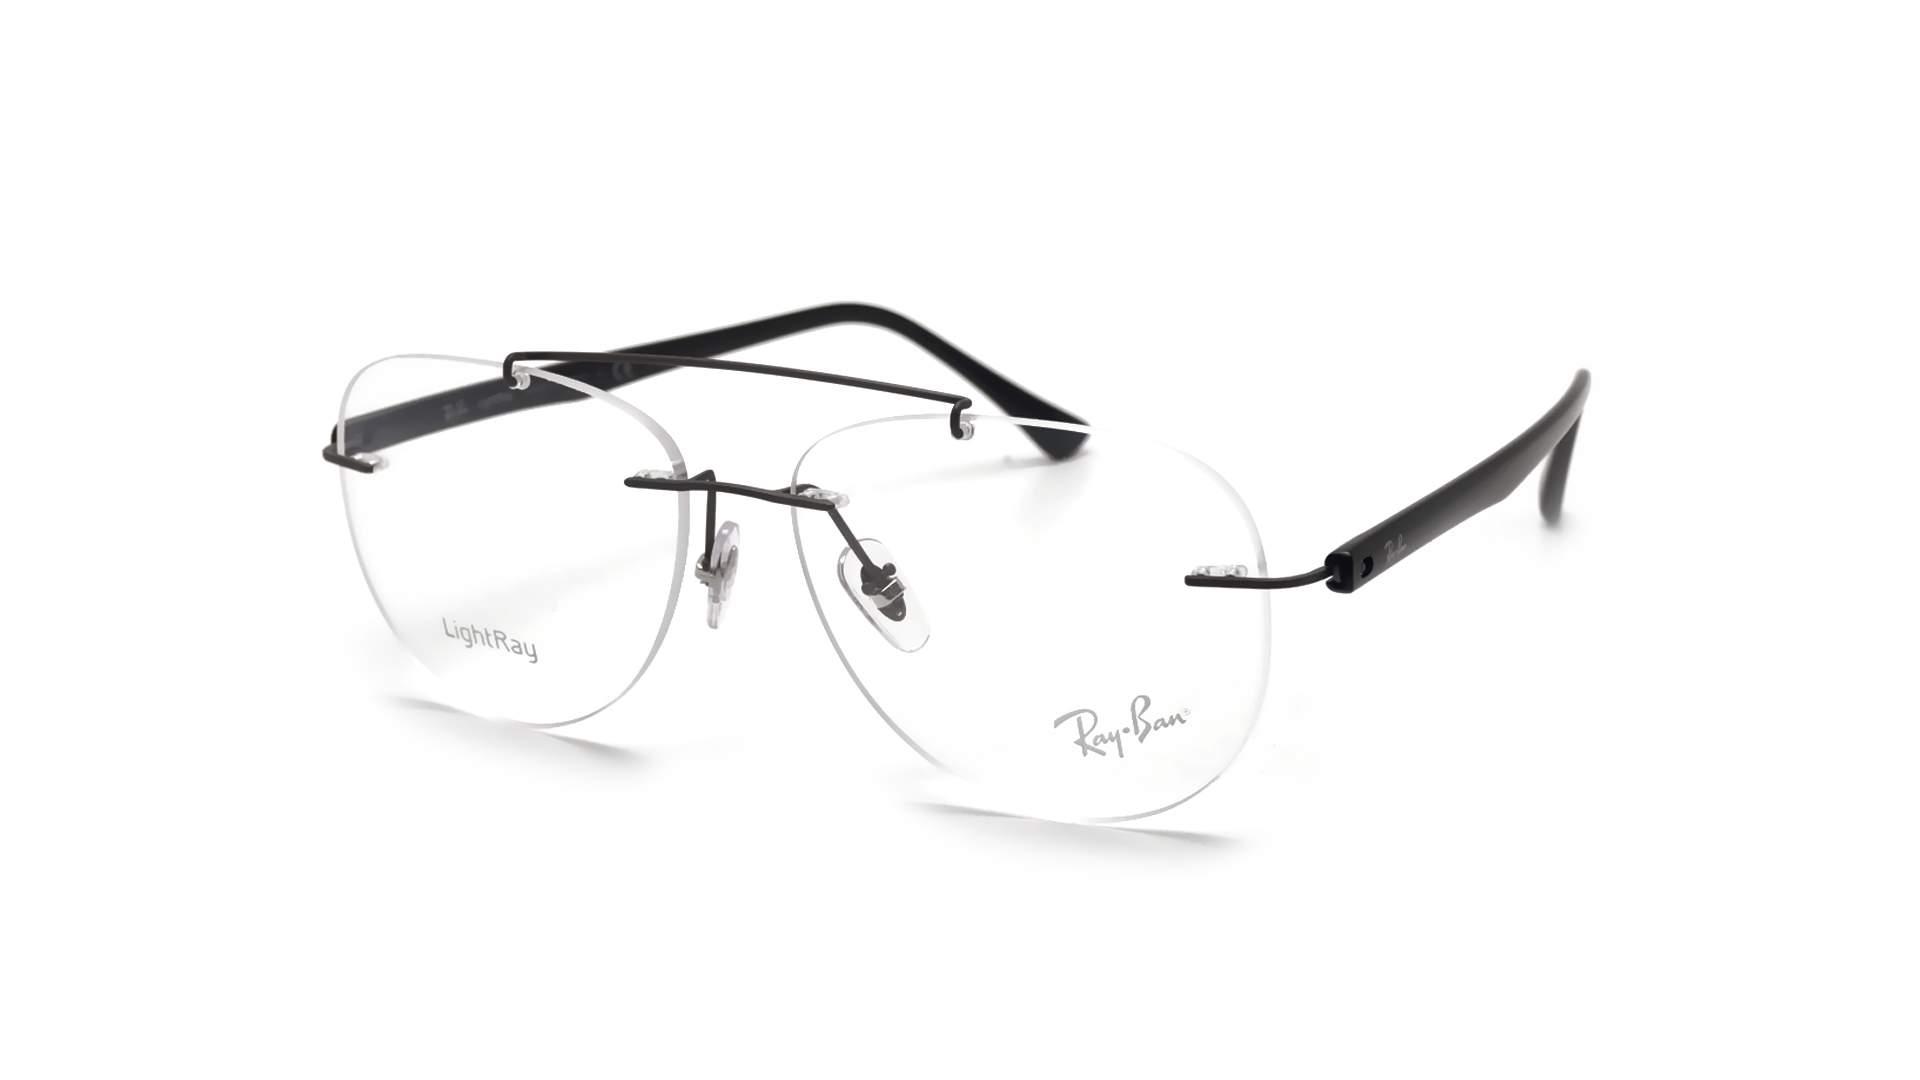 757ddfcb0718 Eyeglasses Ray-Ban RX8749 RB8749 1128 54-14 Grey Matte Large